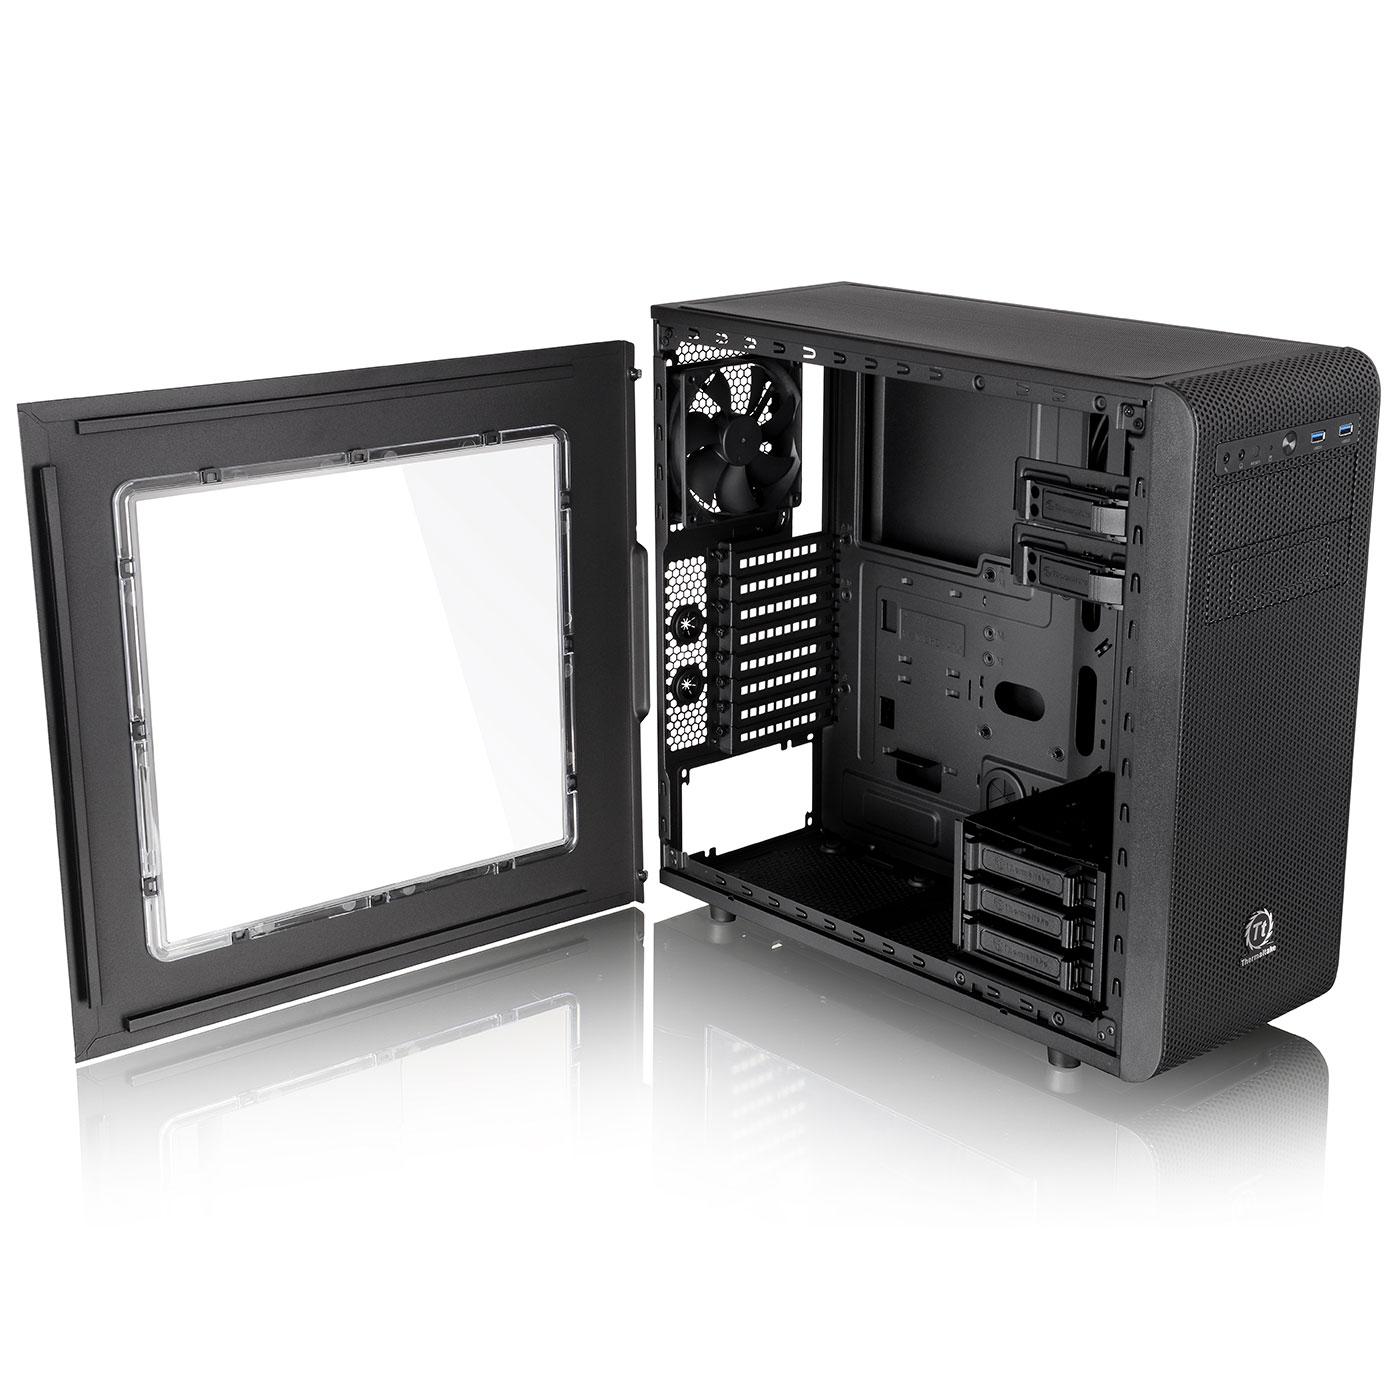 https://media.hardware.fr/ld/products/00/03/02/64/LD0003026404_2.jpg